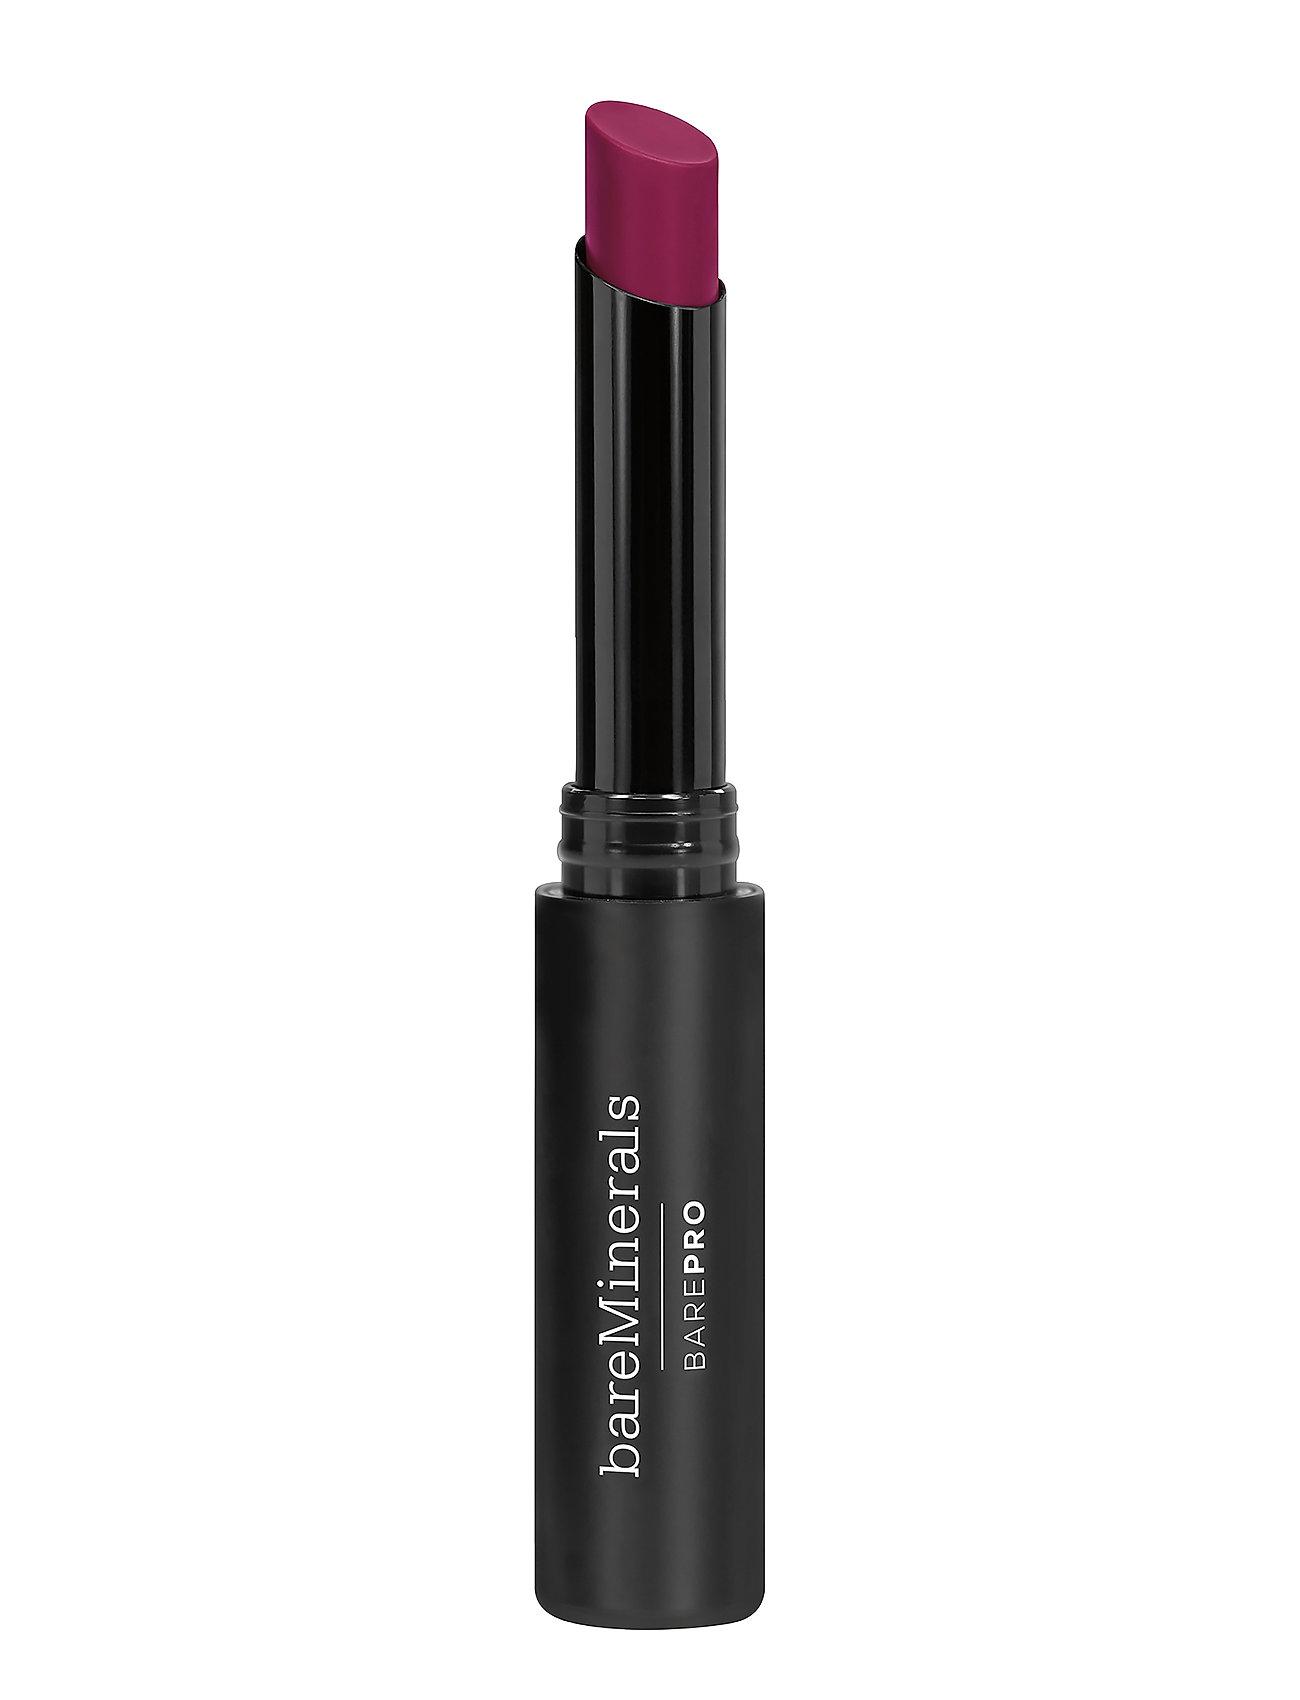 Image of Barepro Longwear Lipstick Petunia Læbestift Makeup Lyserød BareMinerals (3138616965)